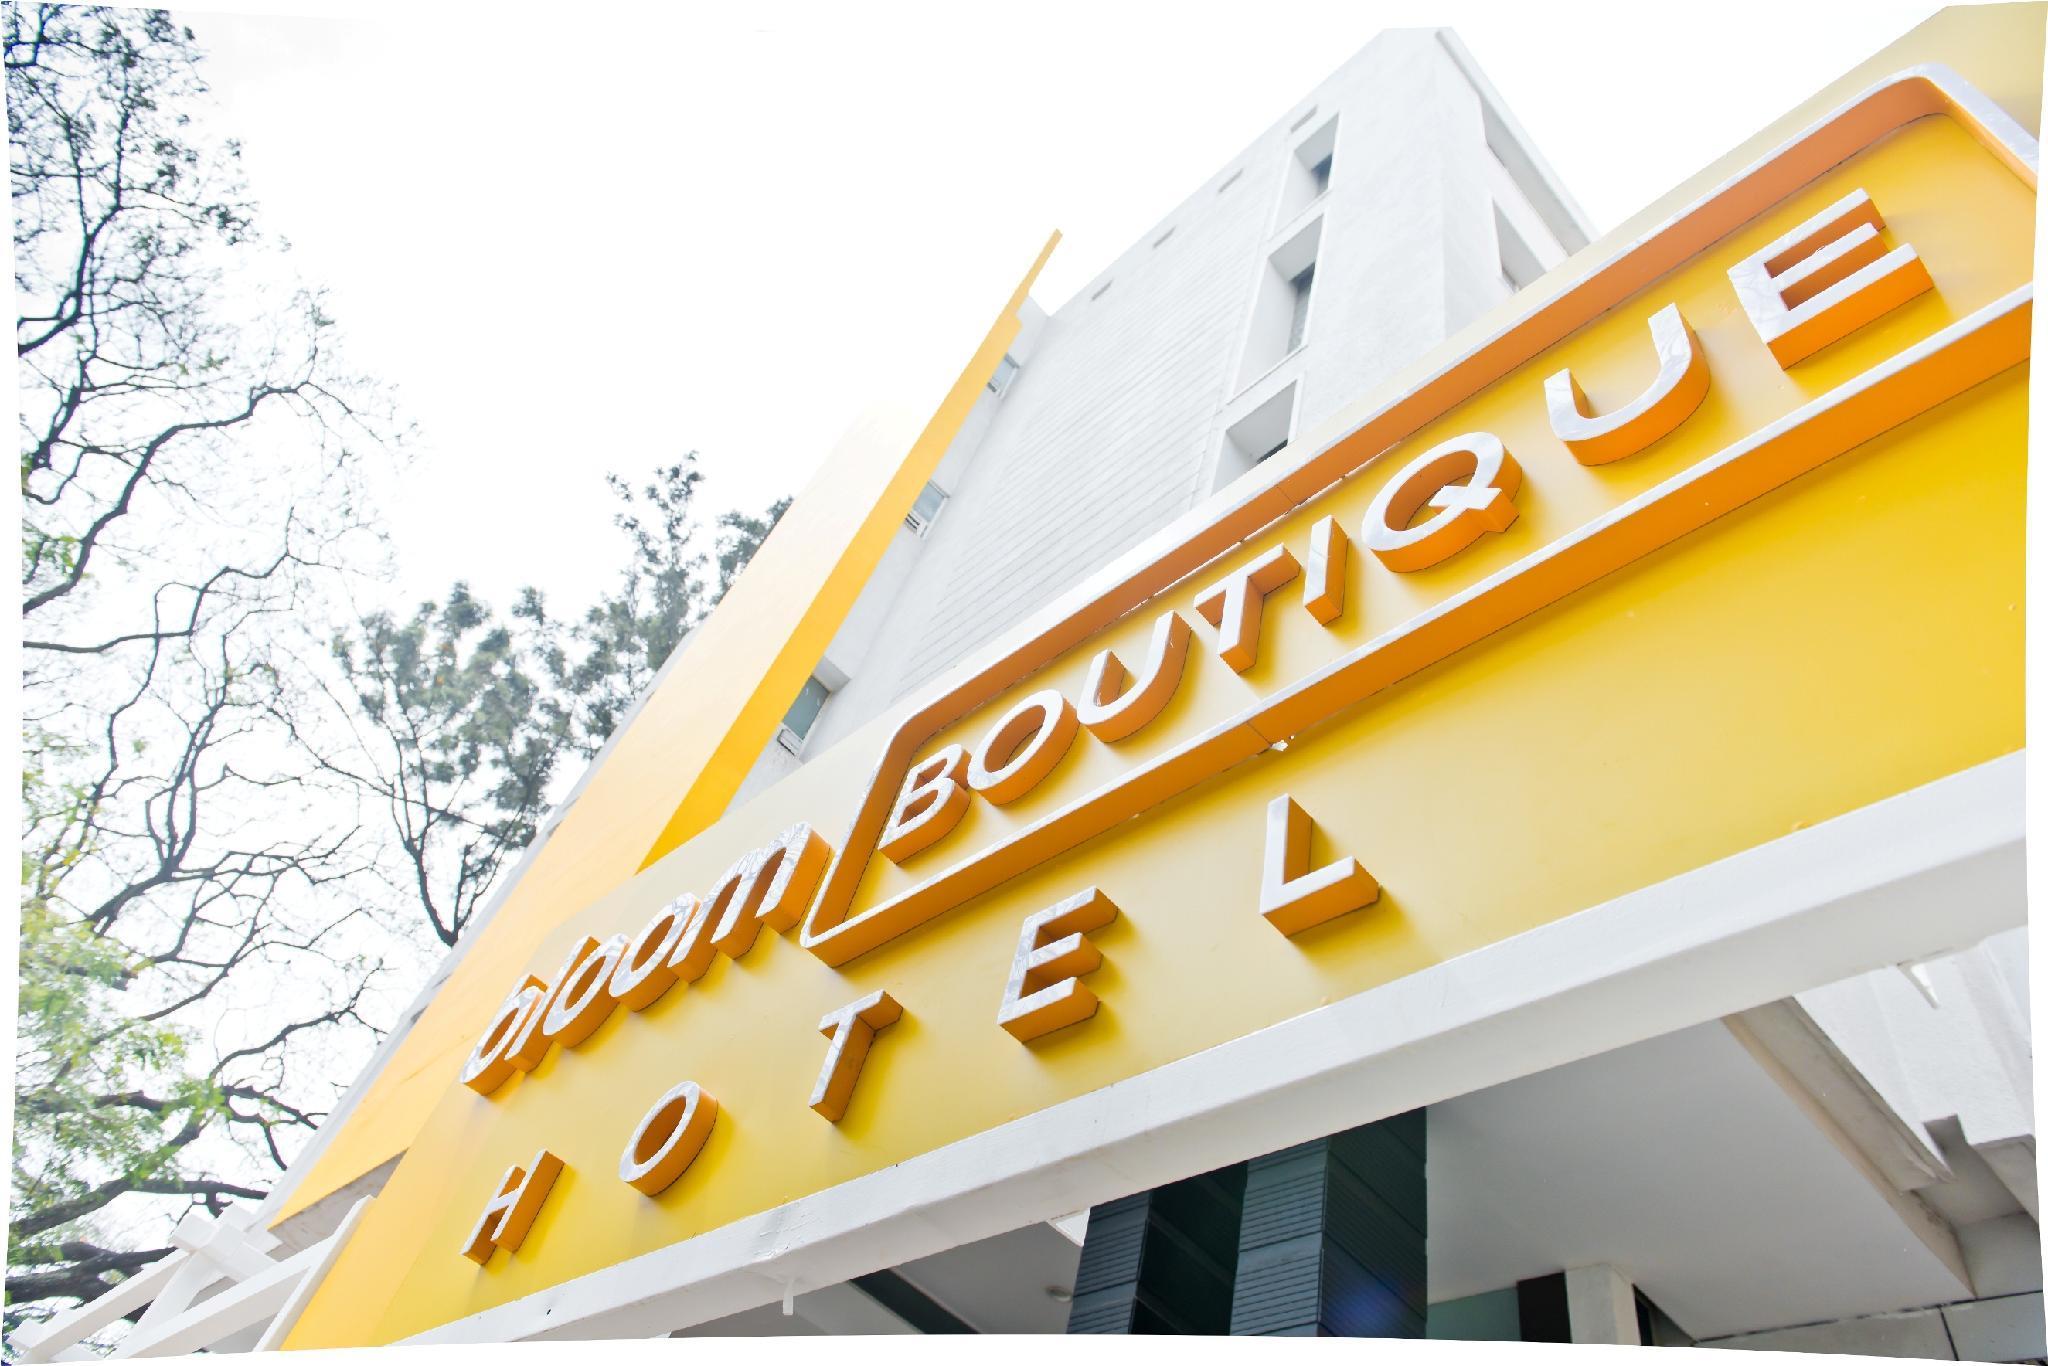 kitchen design bangalore movable cabinets 班加罗尔英迪拉格尔布鲁姆精酒店i bloom boutique i indiranagar 舒适 英迪拉格尔布鲁姆精酒店i